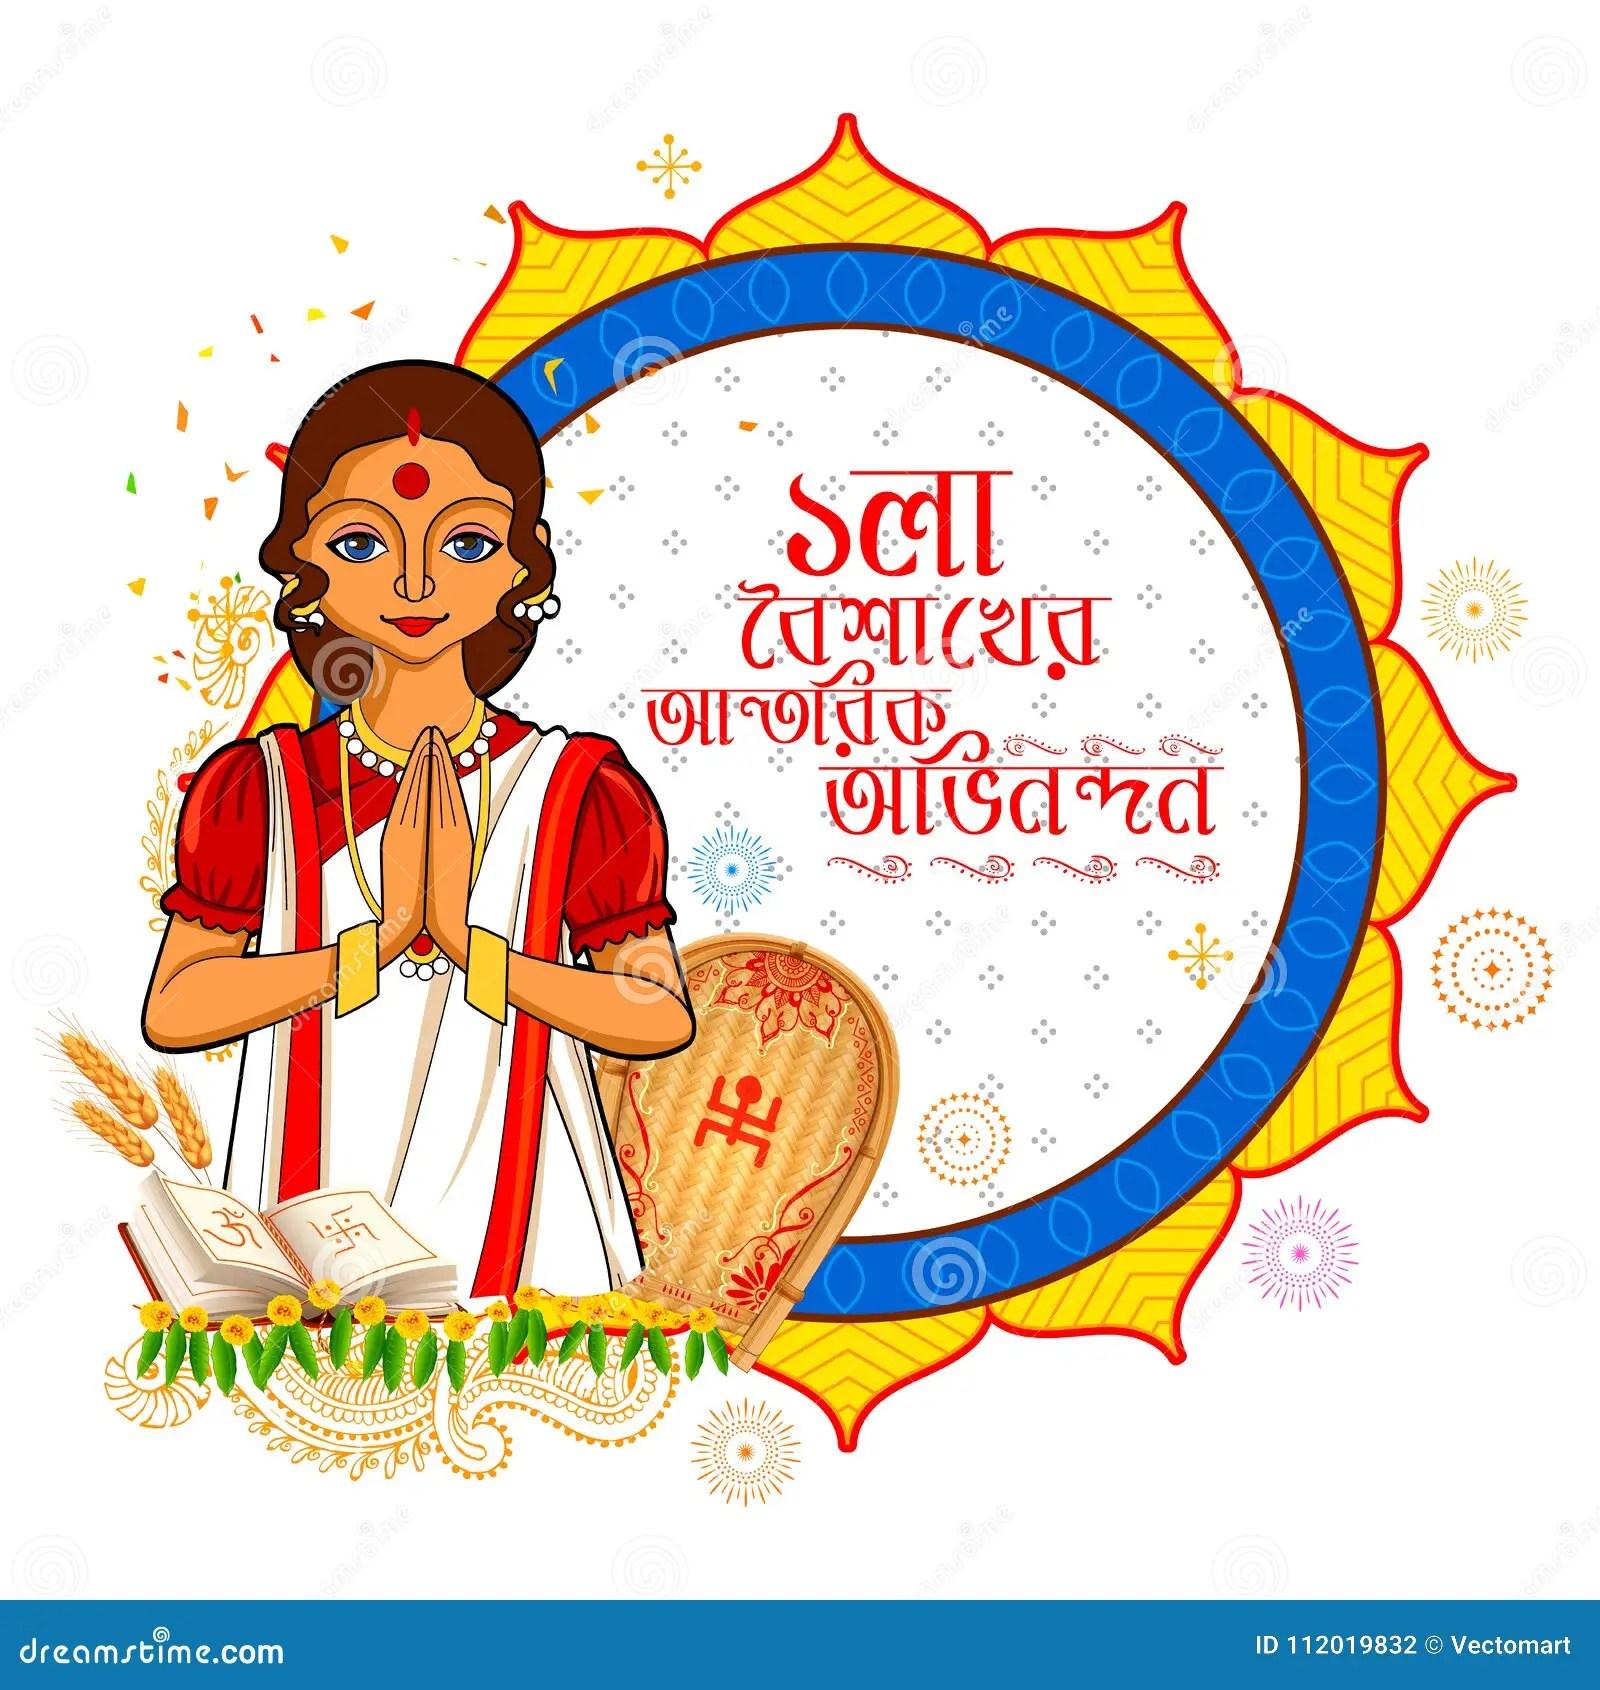 Greeting Background With Bengali Text Poila Boisakher